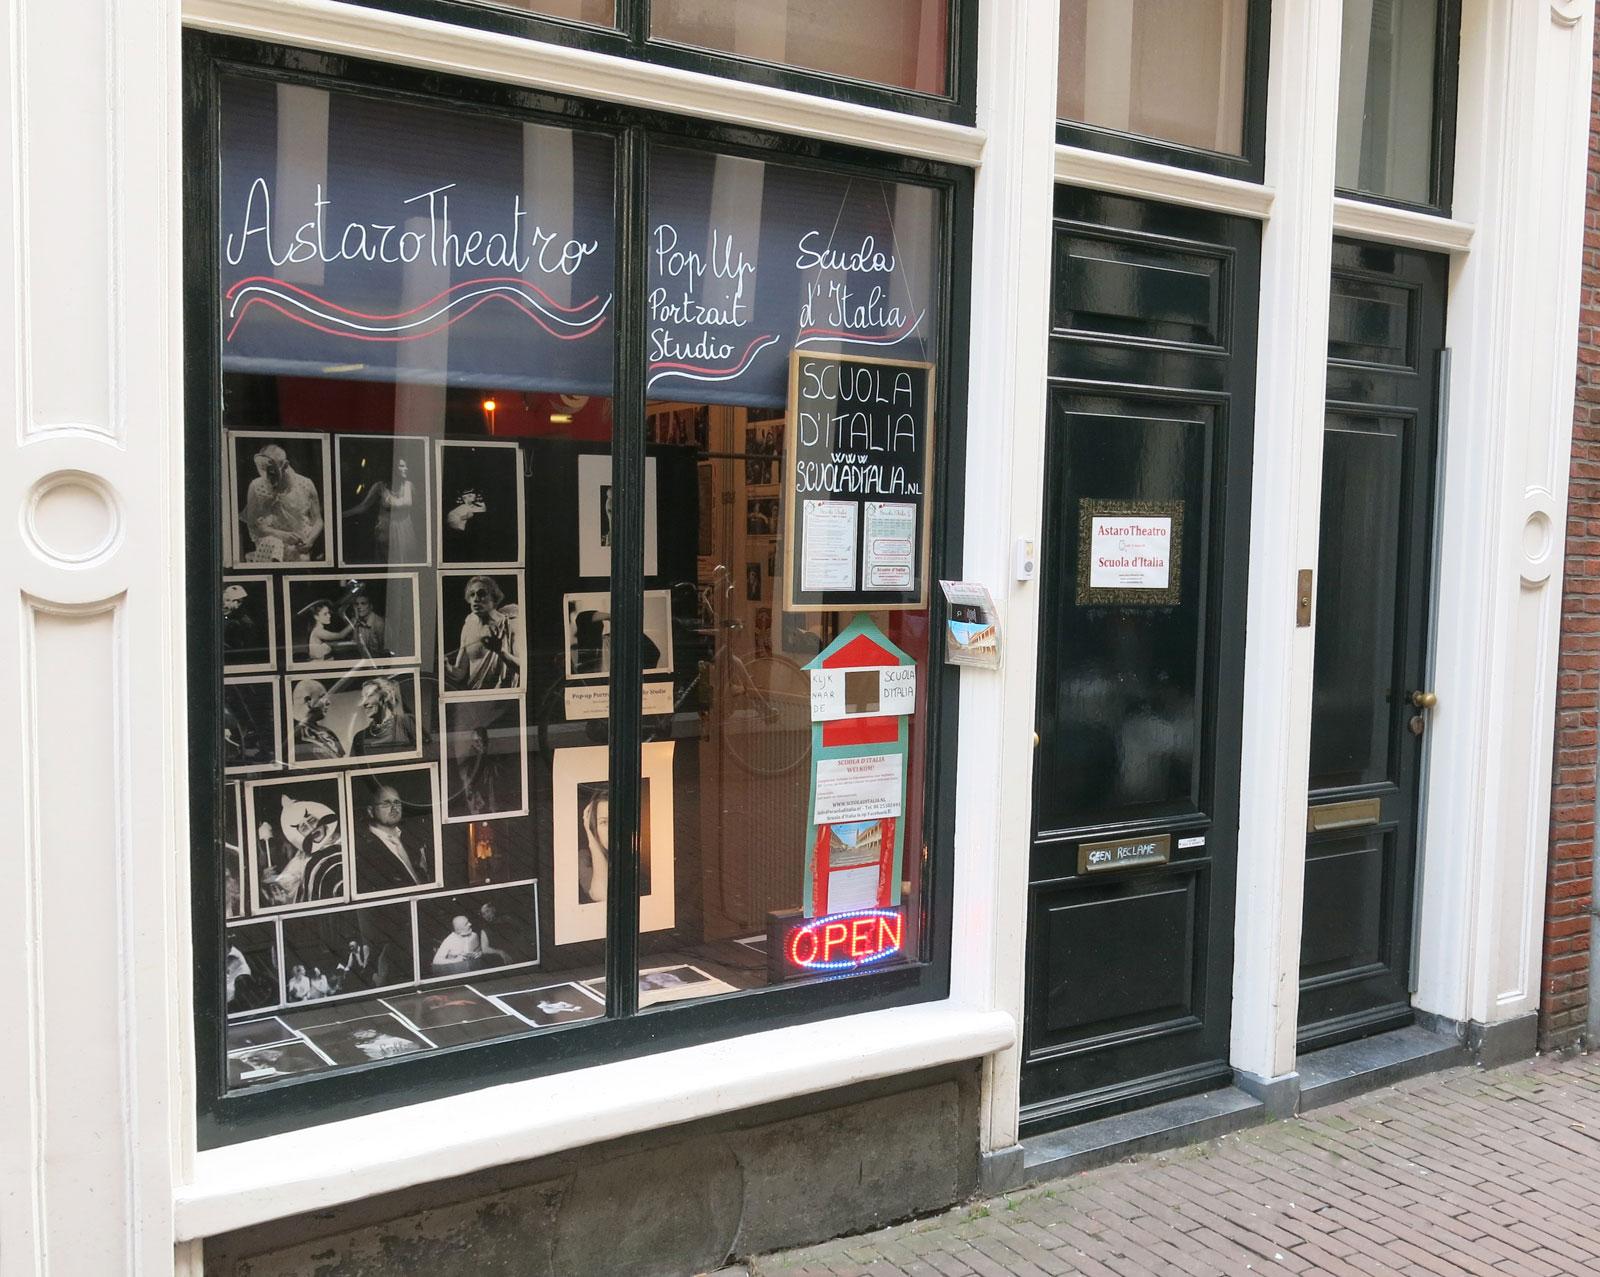 Scuola d'Italia - Sint Jansstraat 37 Amsterdam